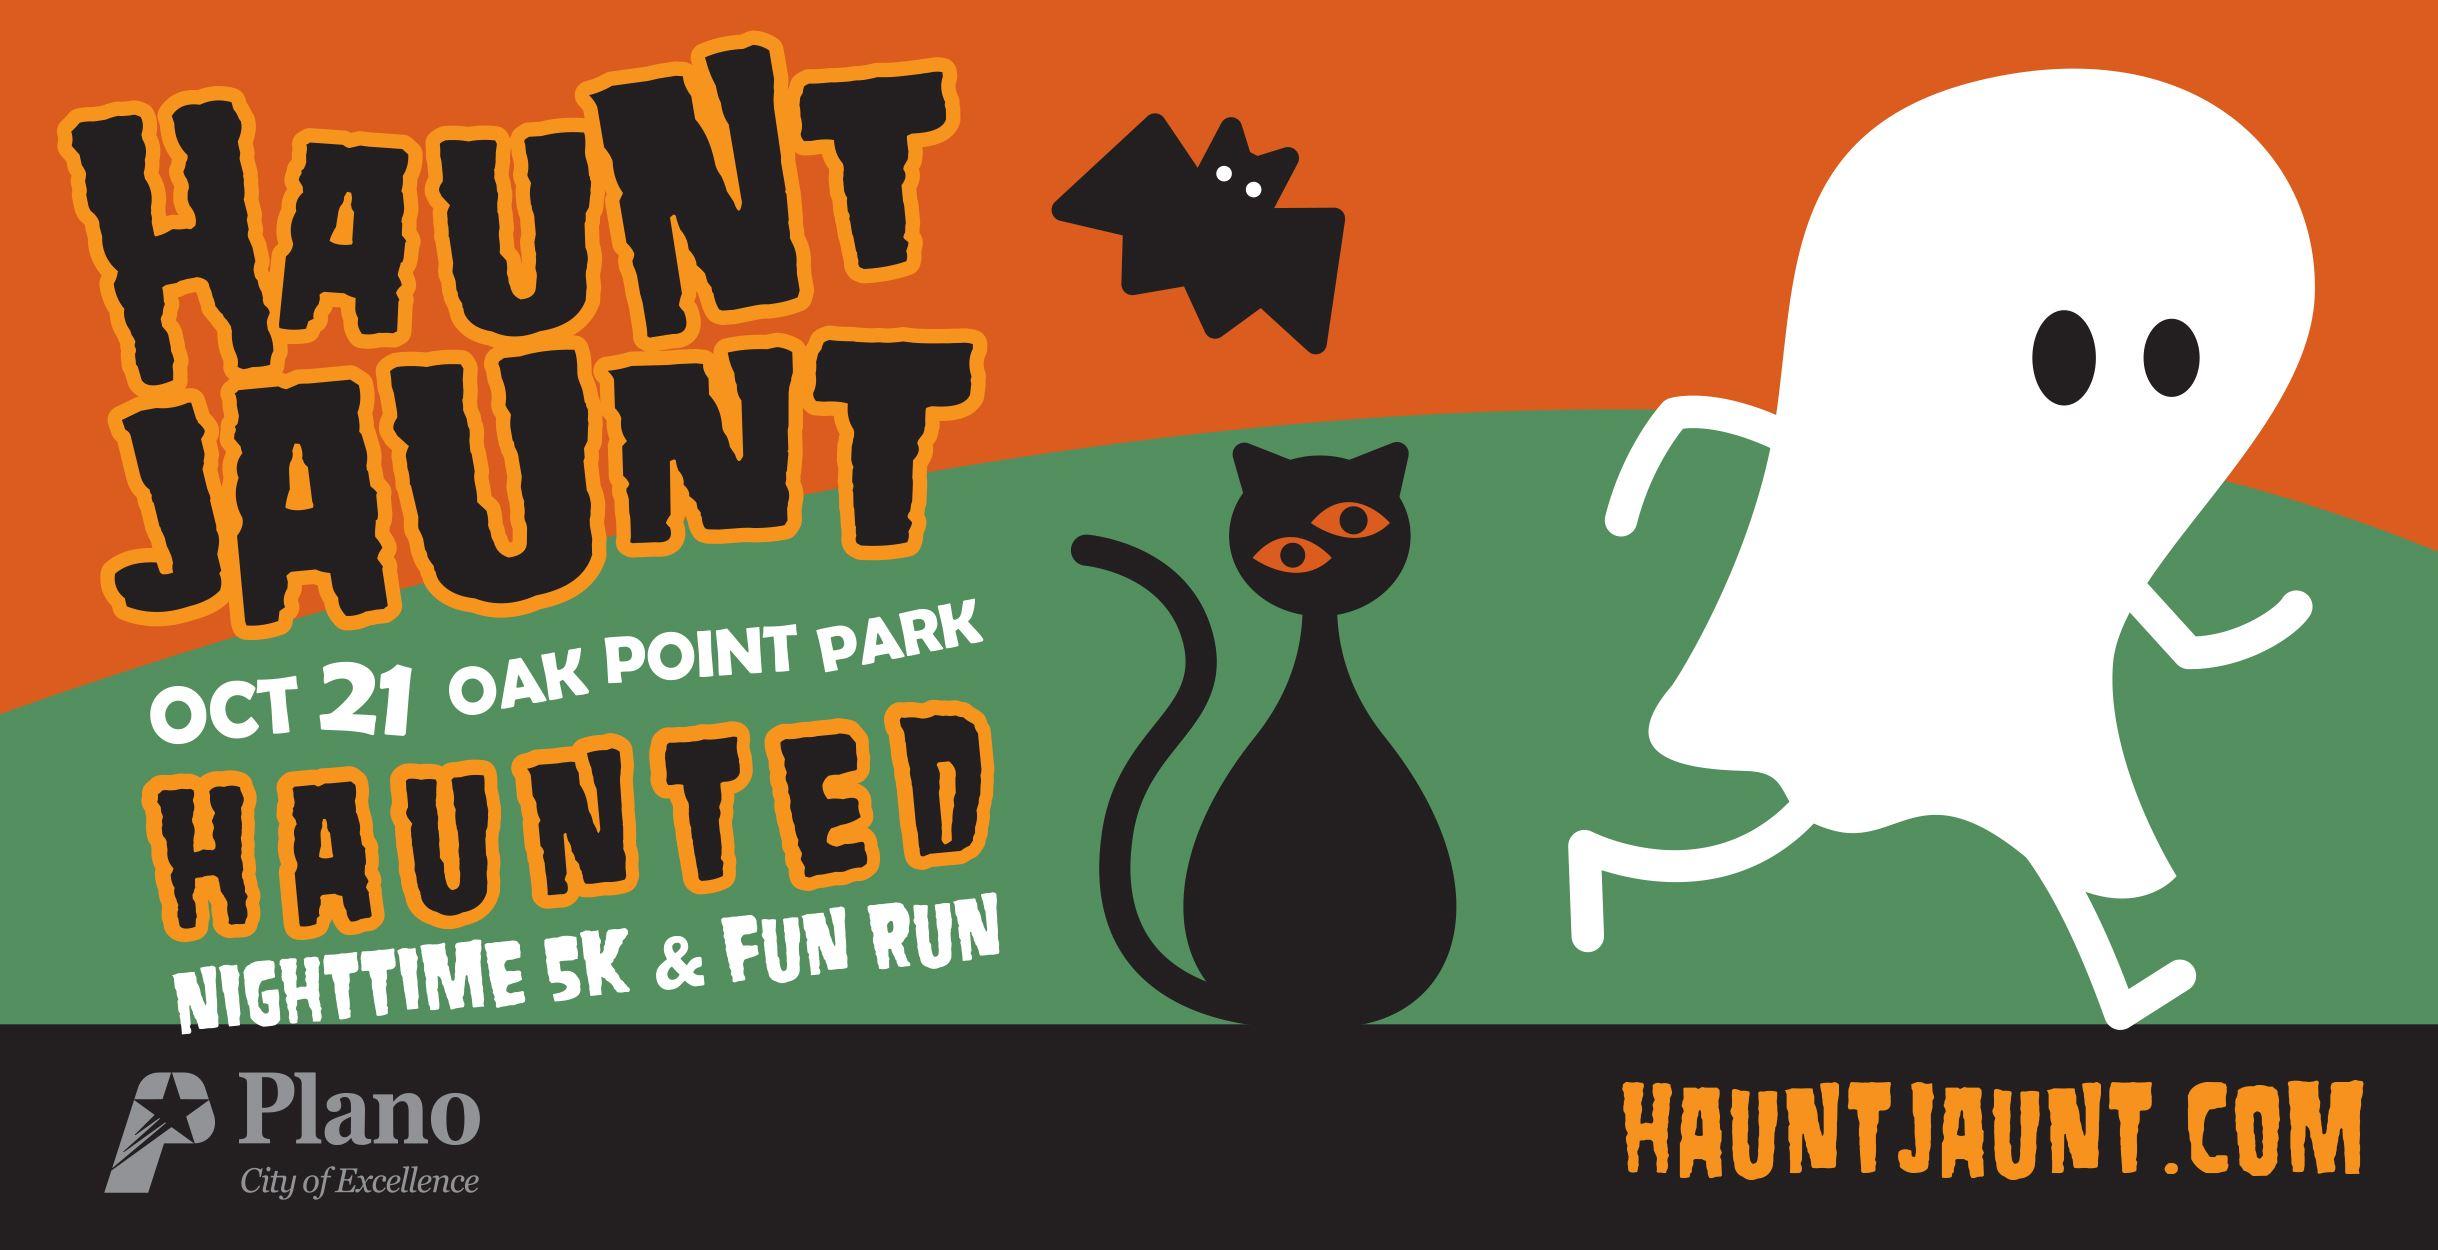 Haunt Jaunt 5K & Fun Run